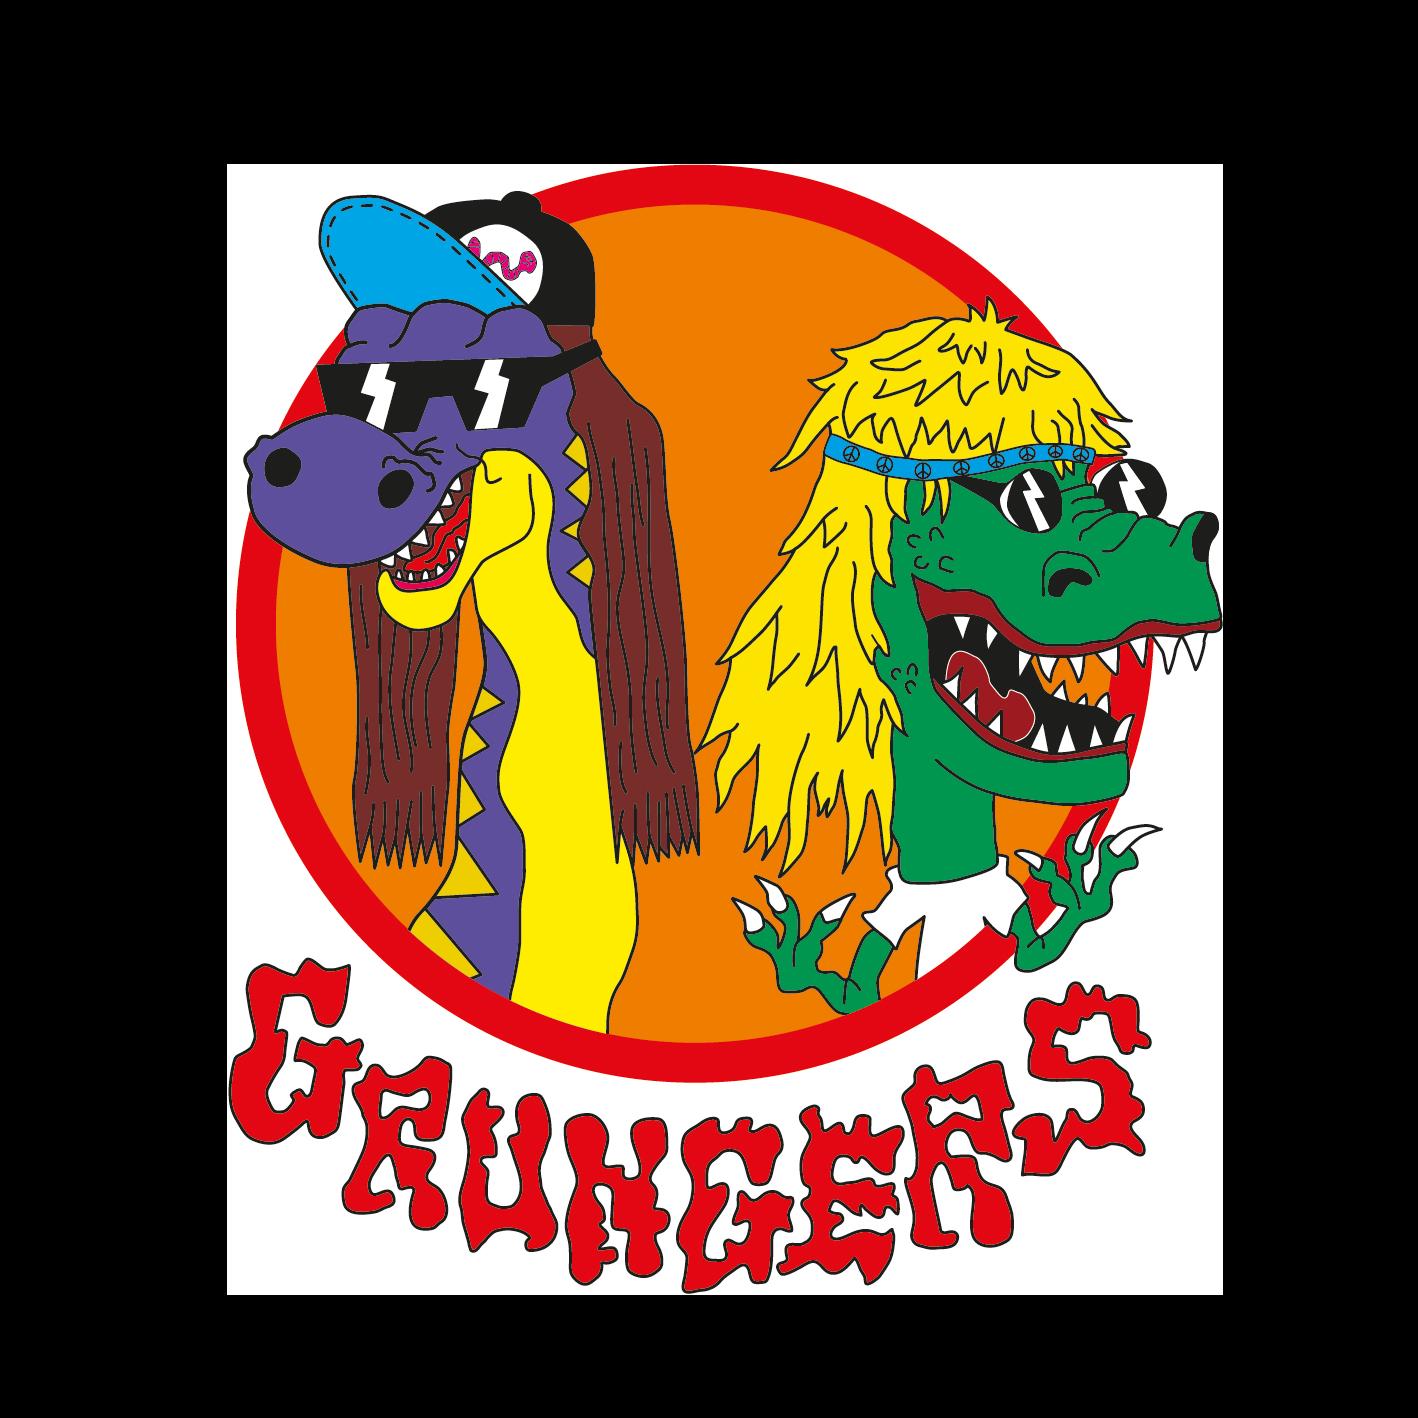 Transparent Grungers 2.png